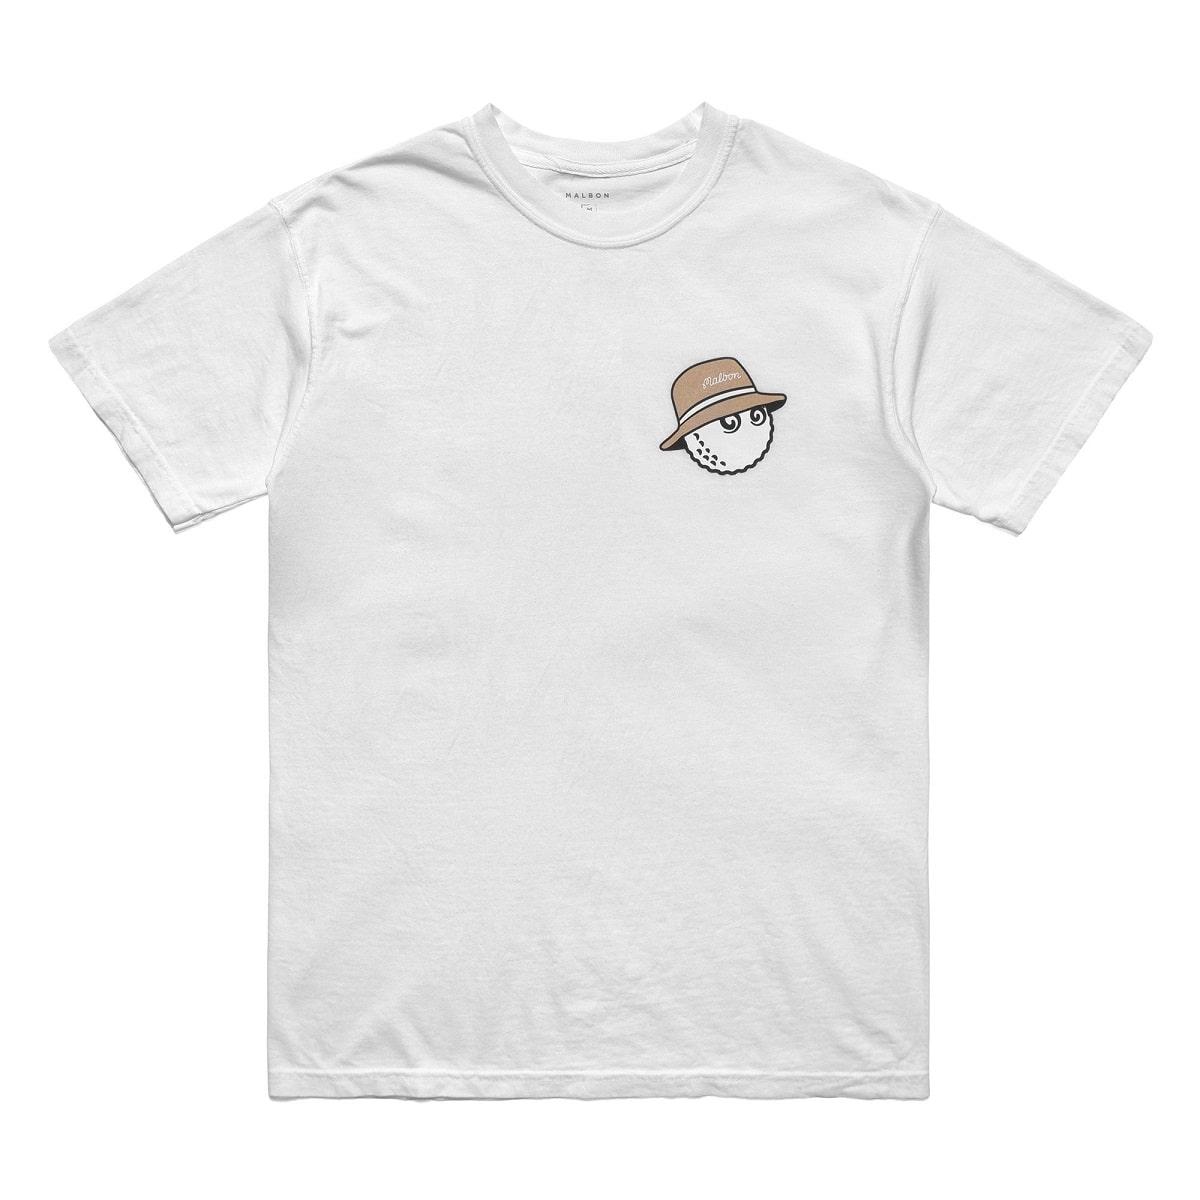 Malbon golf shirt